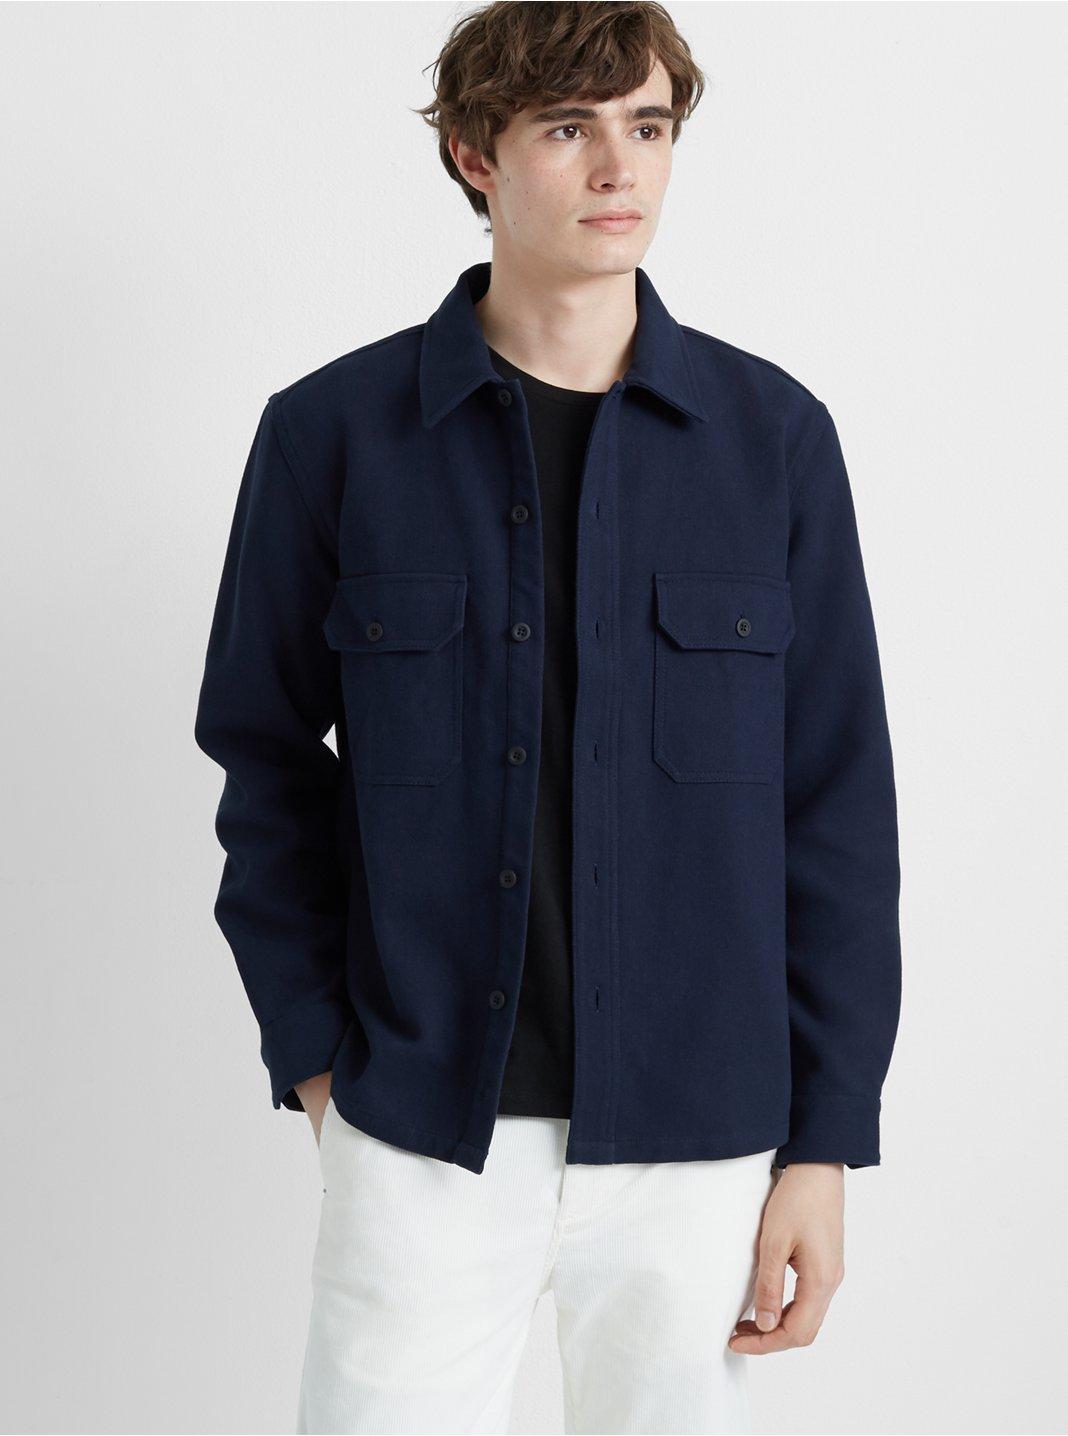 Workshirt Jacket